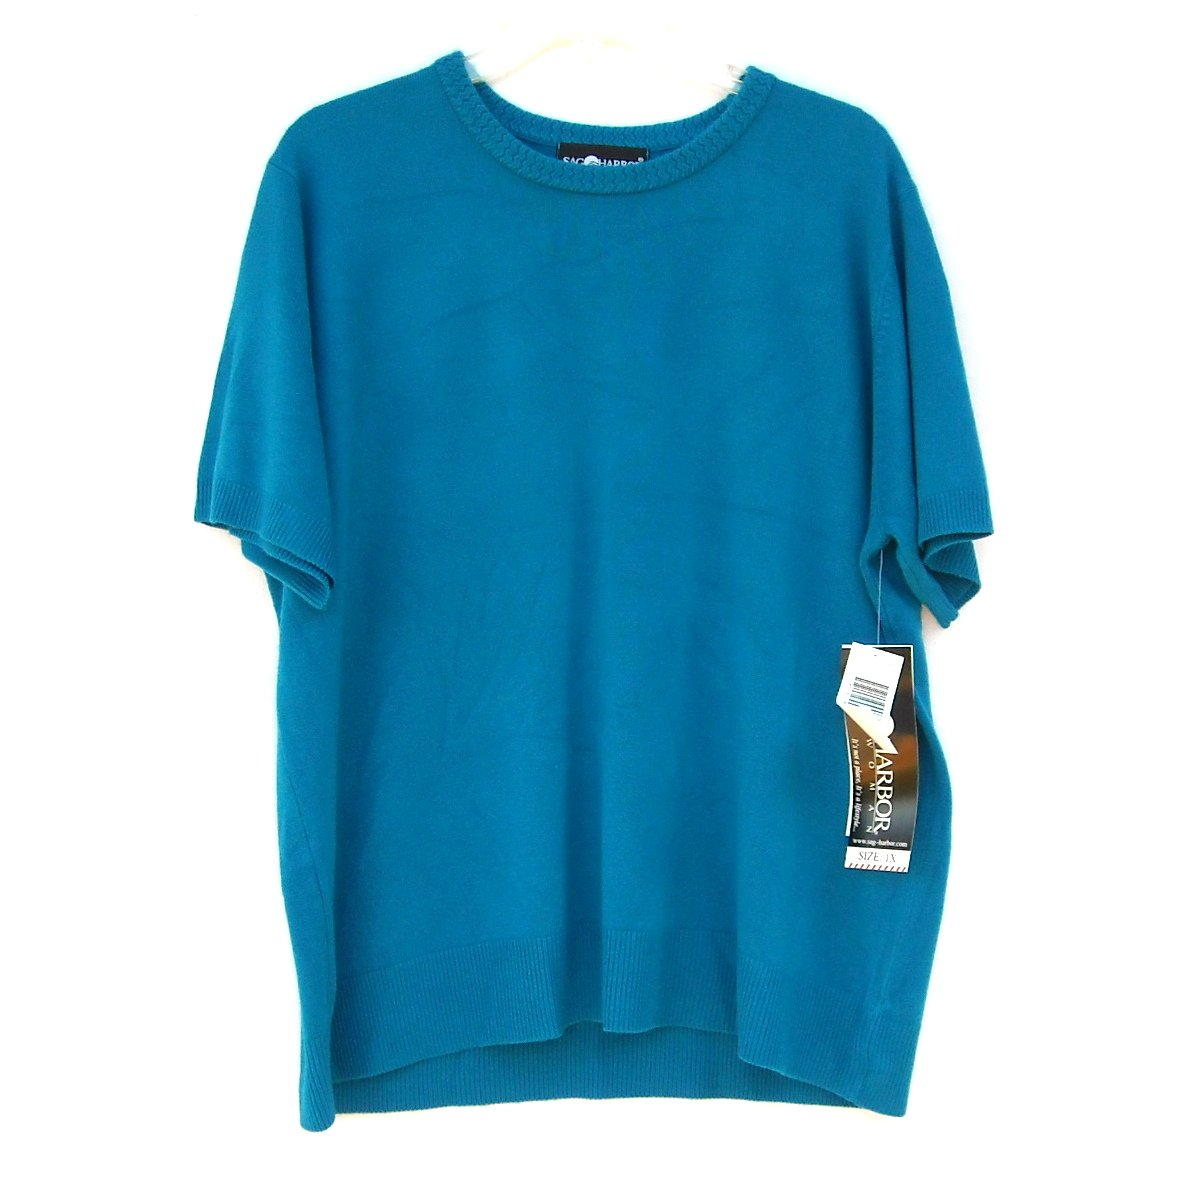 Sag Harbor Womens Blue Short Sleeve Knit Top Size 1X